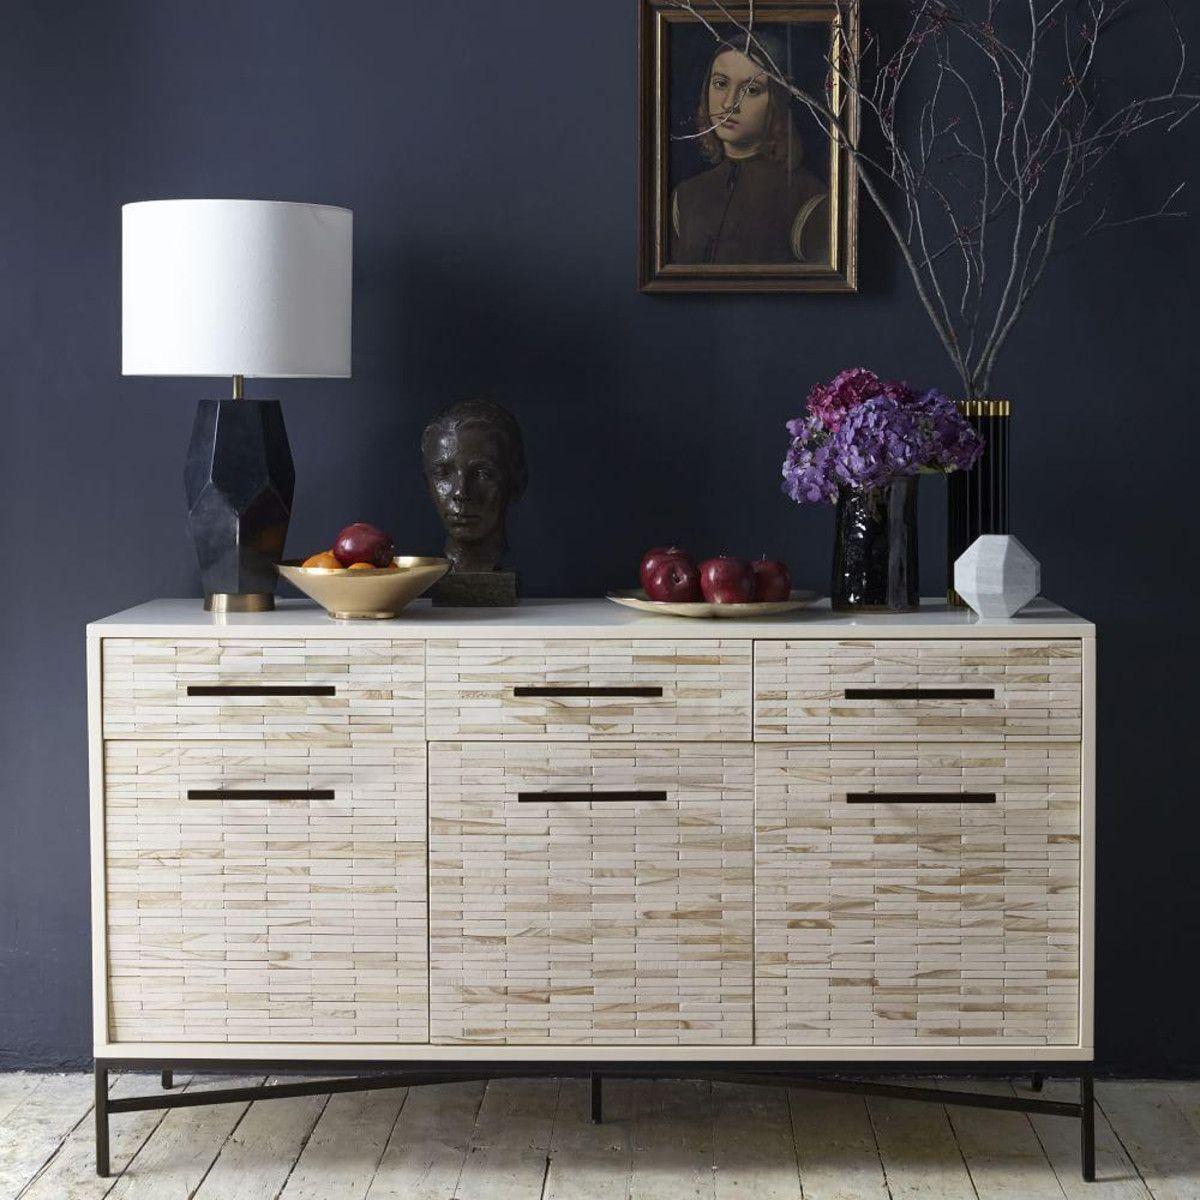 Wood Tiled Sideboard Modern Buffet Table Decor Mid